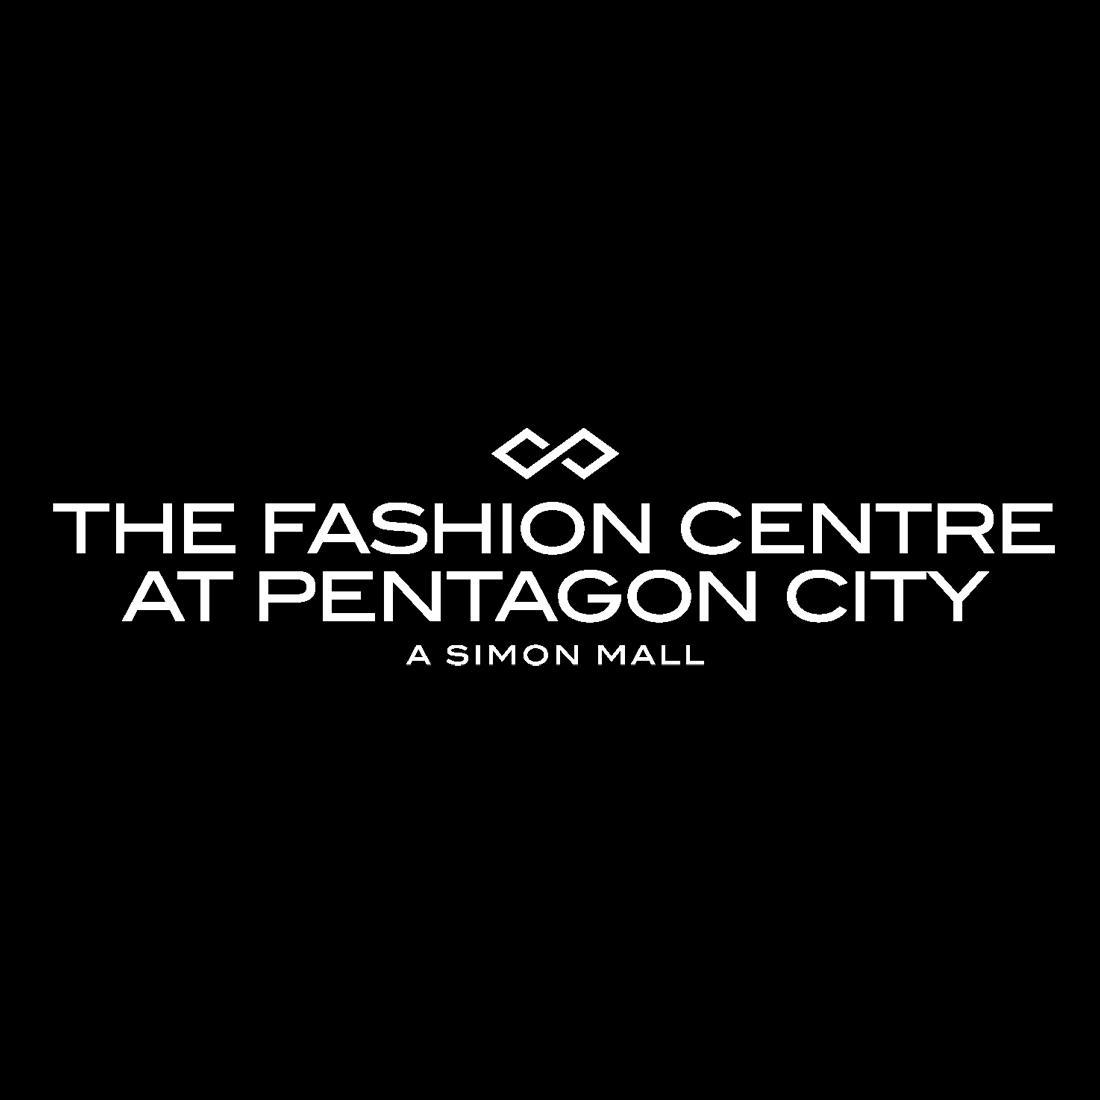 Fashion Centre at Pentagon City